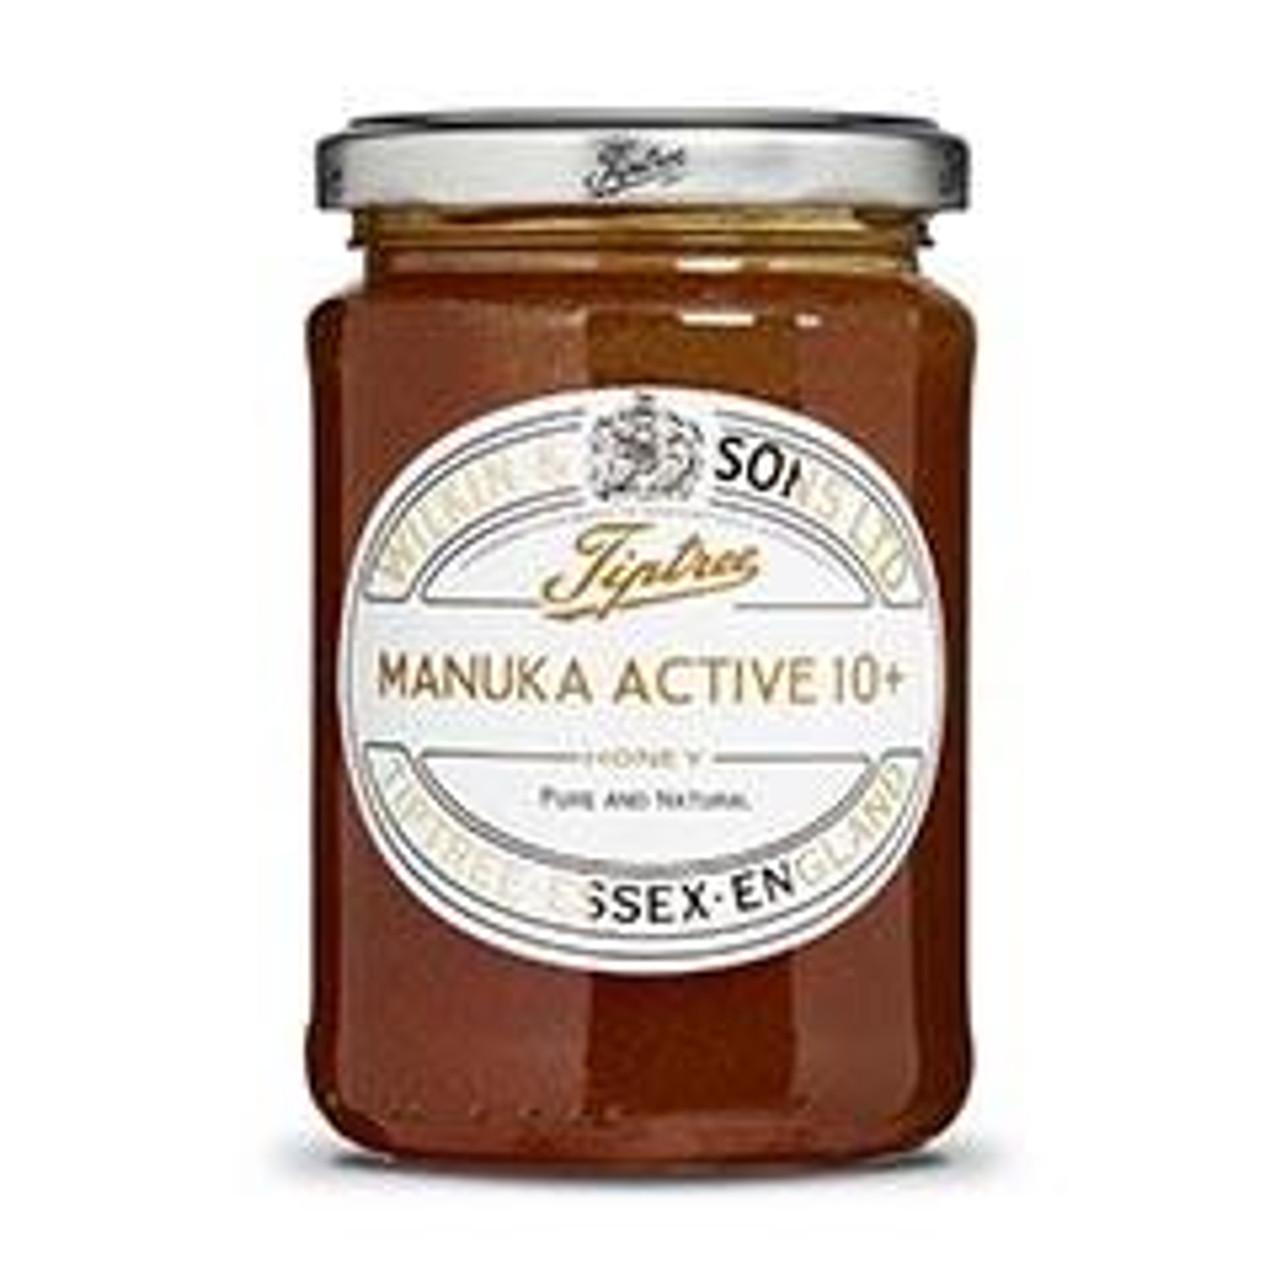 Tiptree Manuka Active 10+ Honey